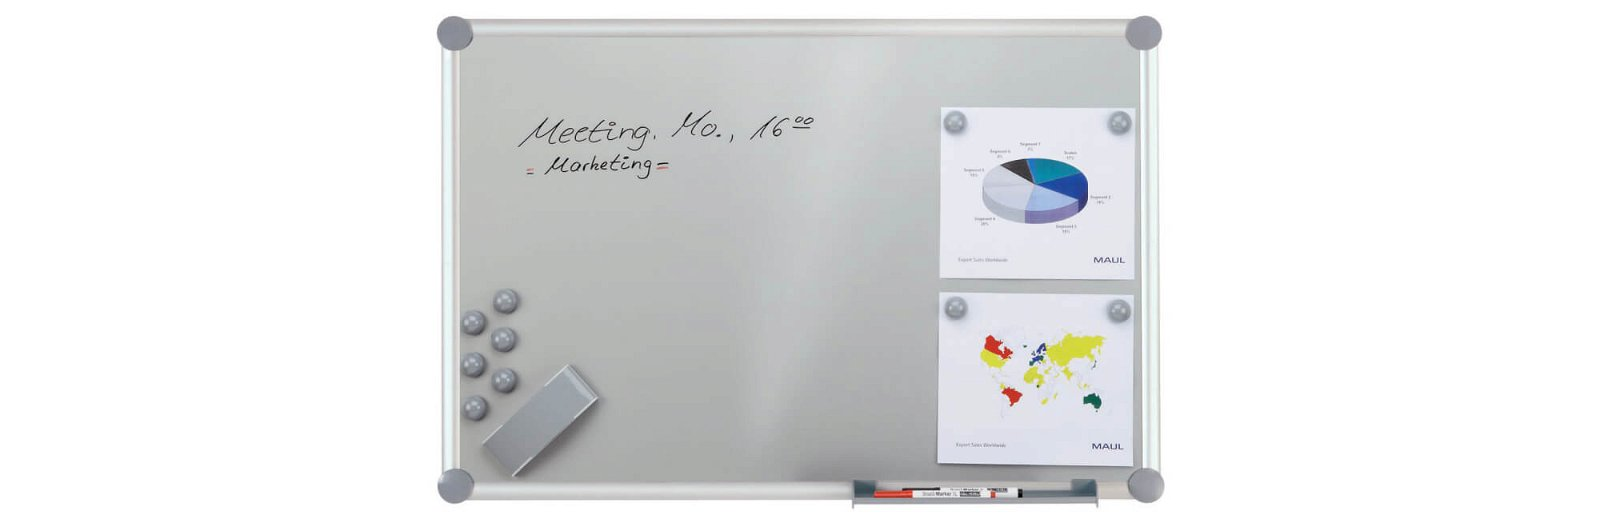 Whiteboard 2000 MAULpro, Komplett-Set silver, 90x120 cm, grau